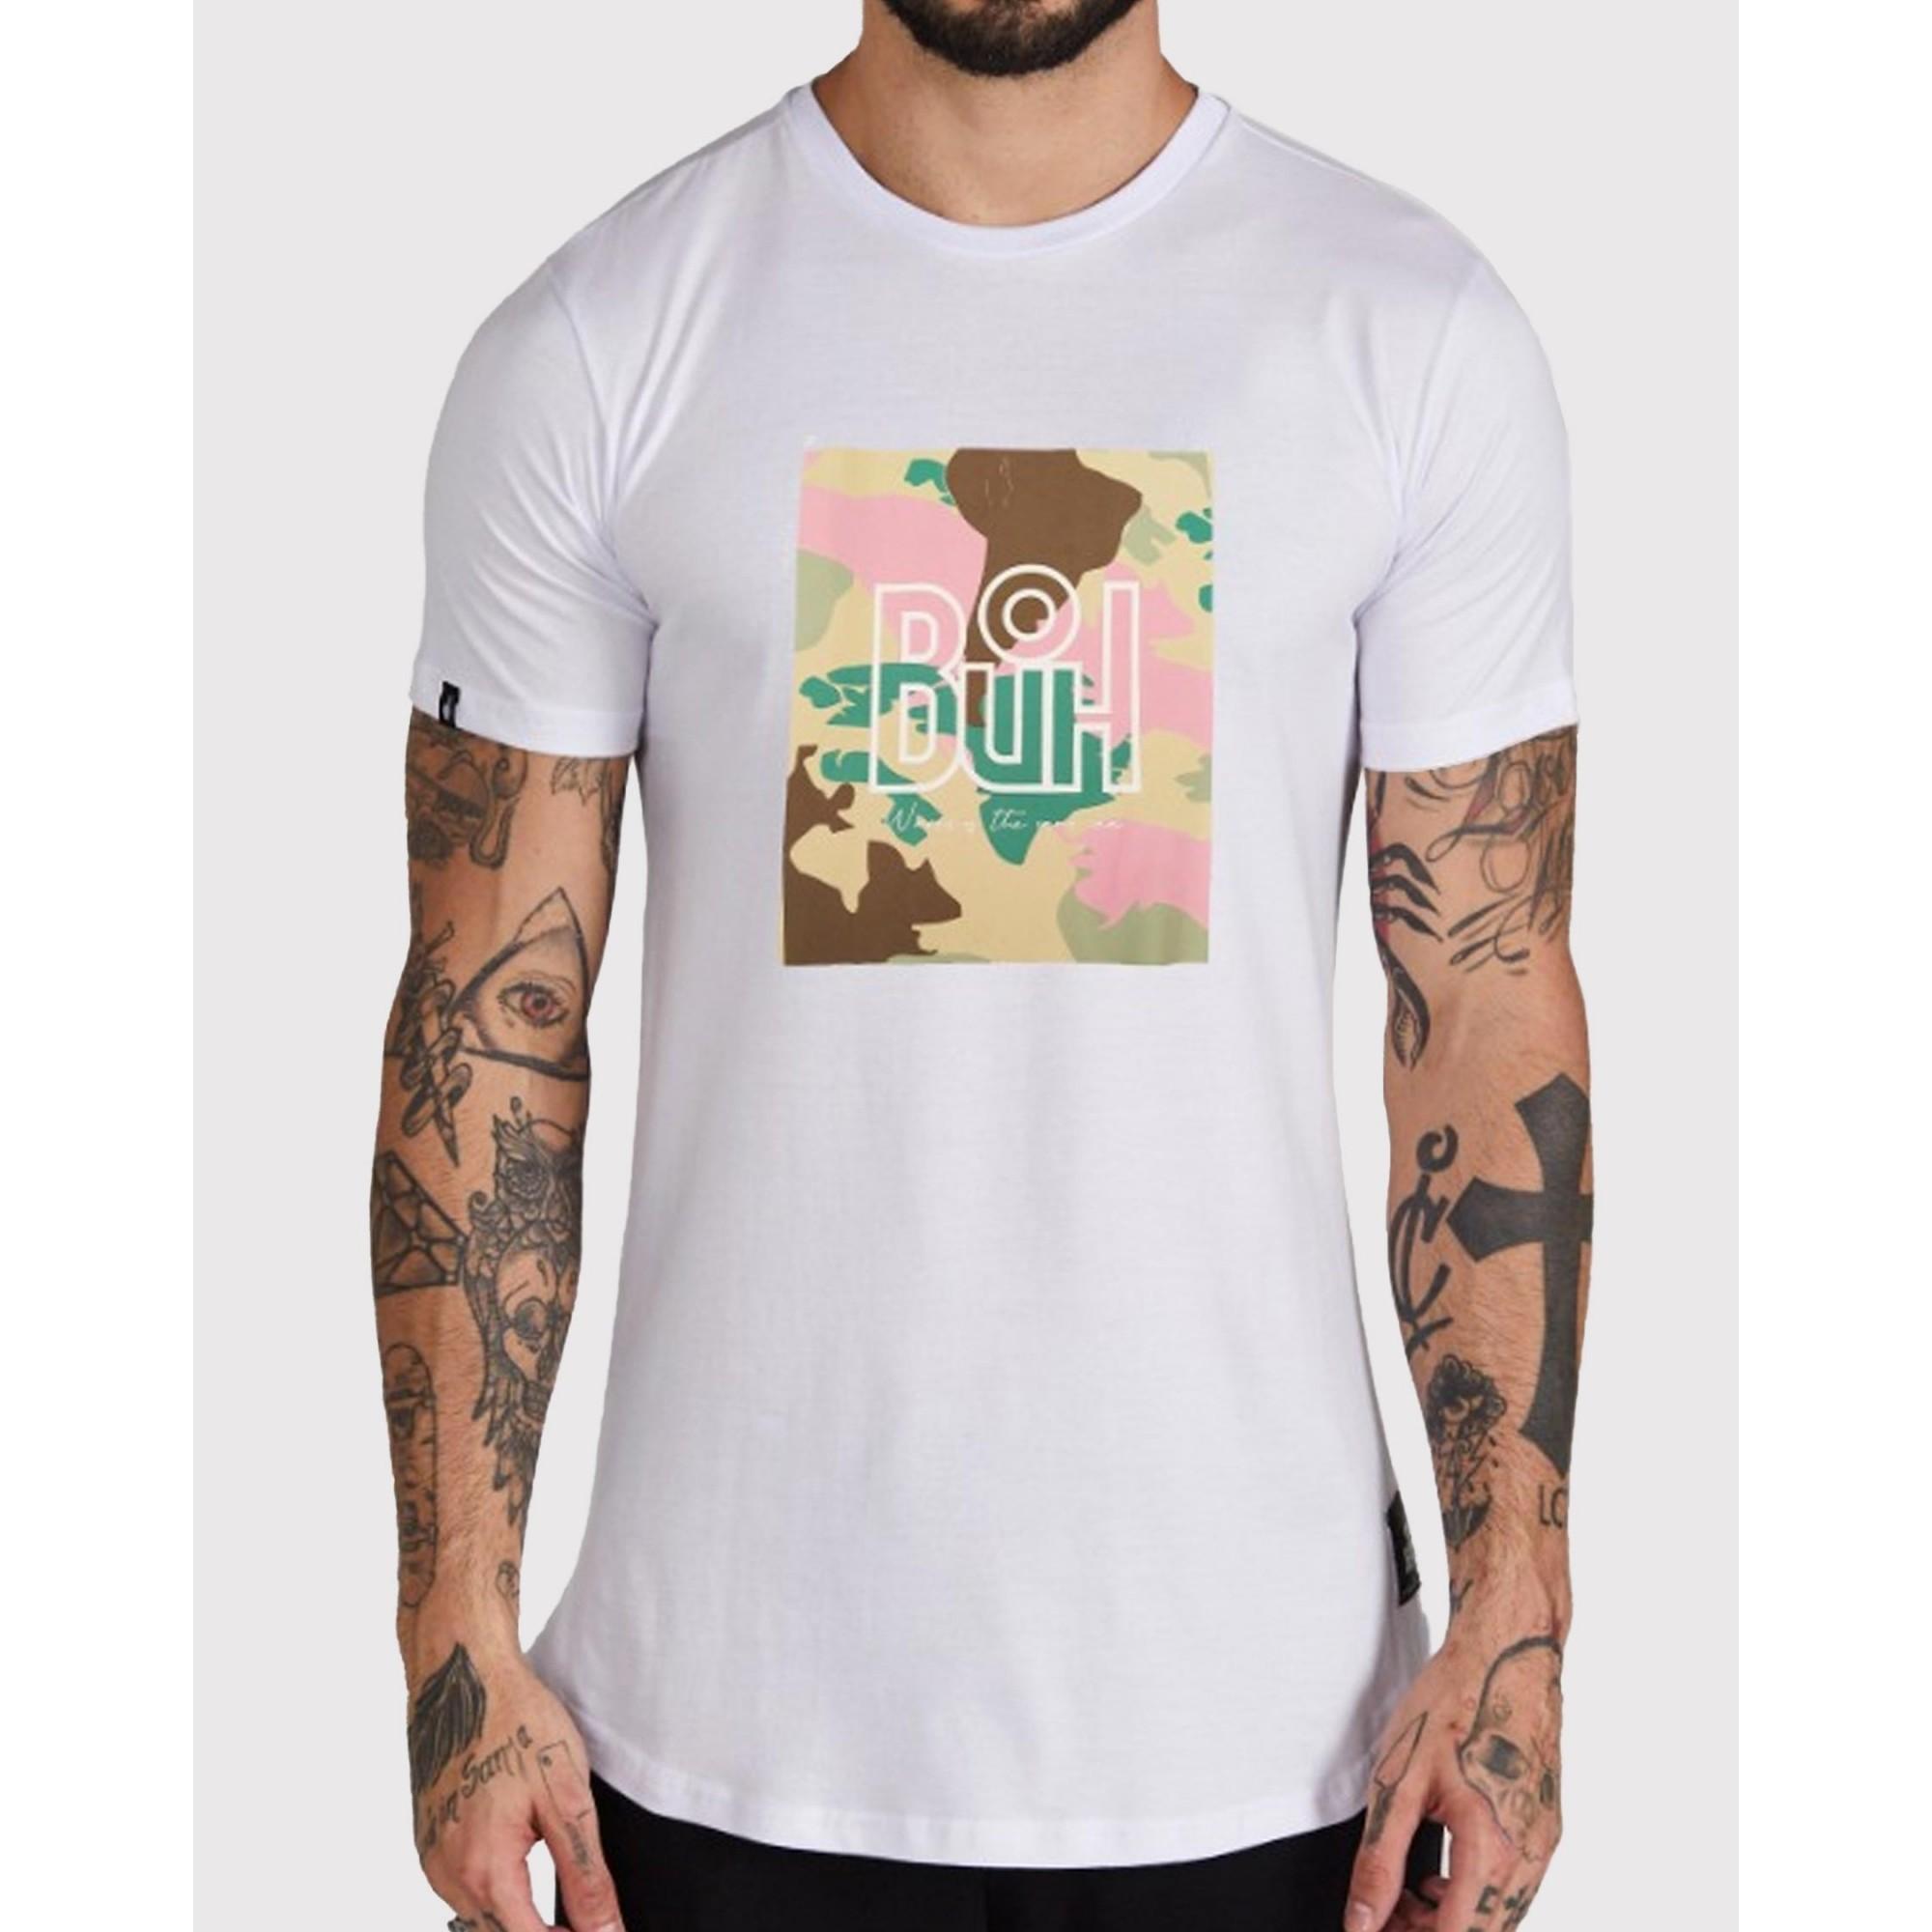 Camiseta Buh Square Map White